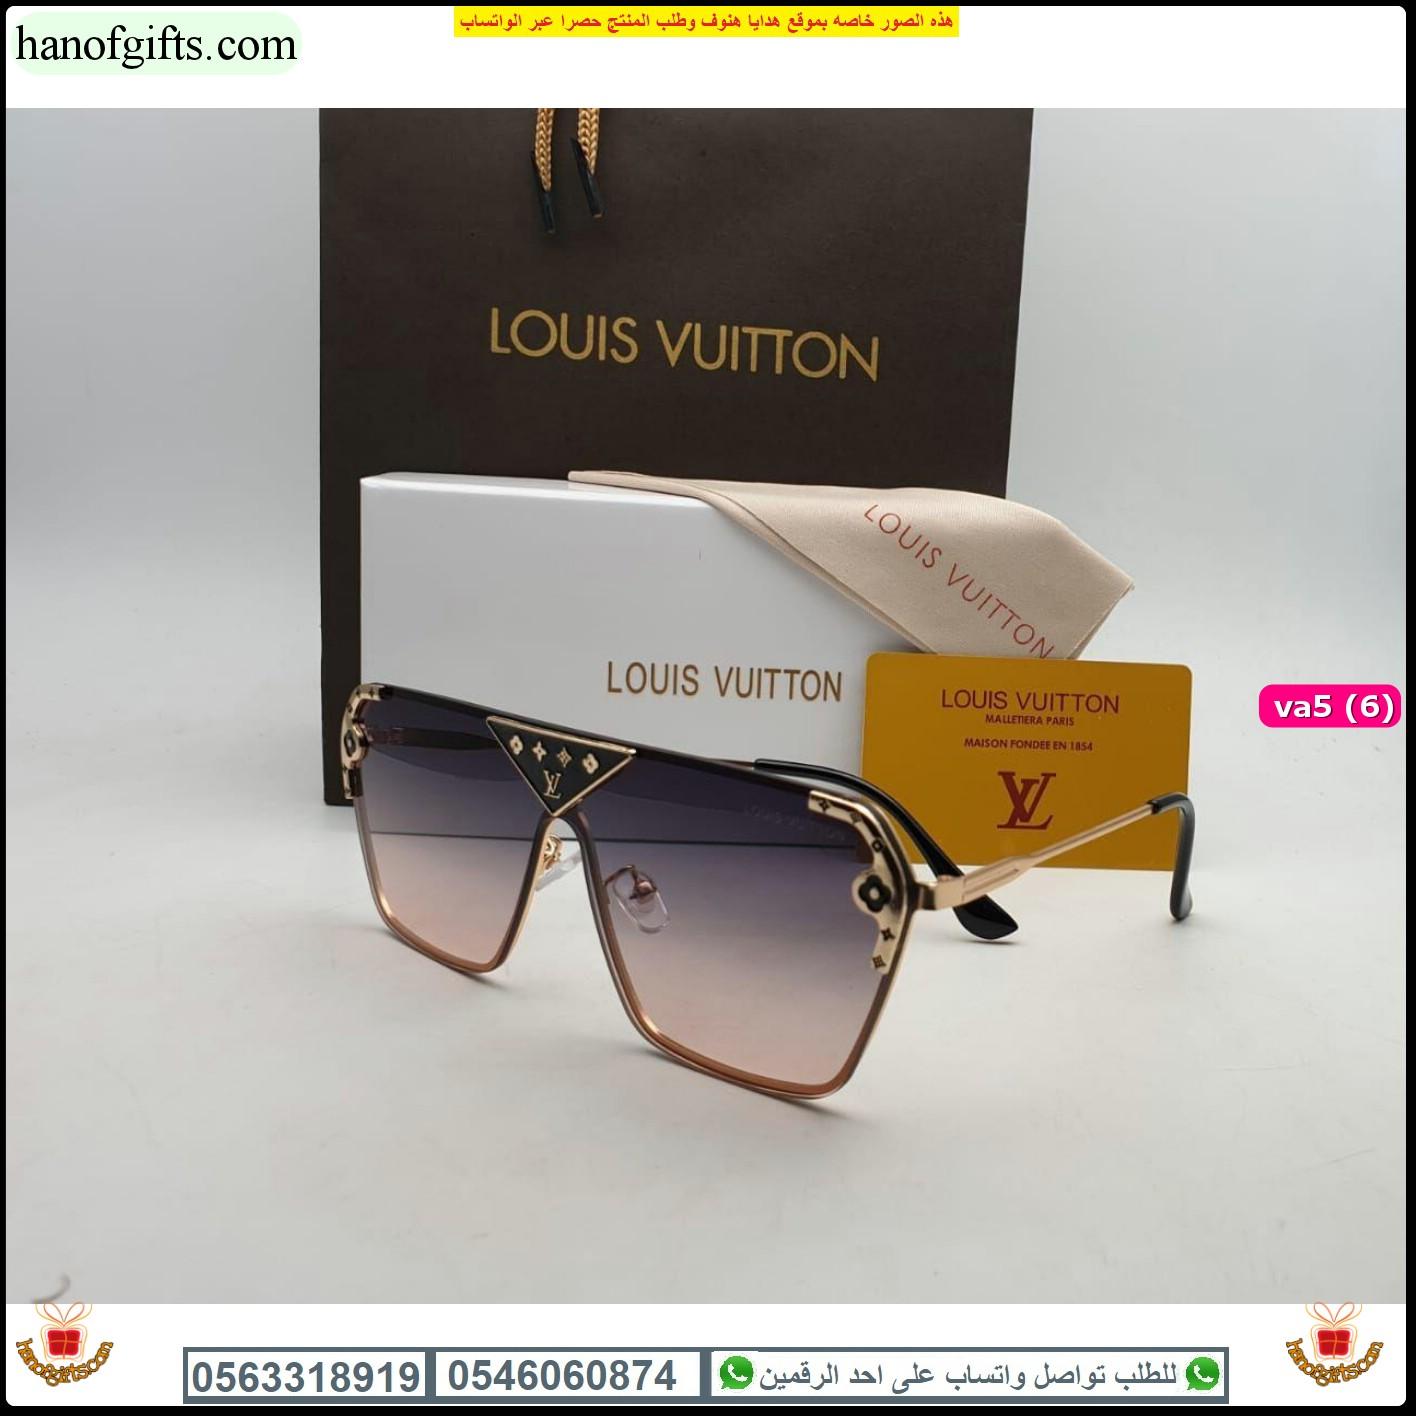 نظارات لويس فيتون نسائي